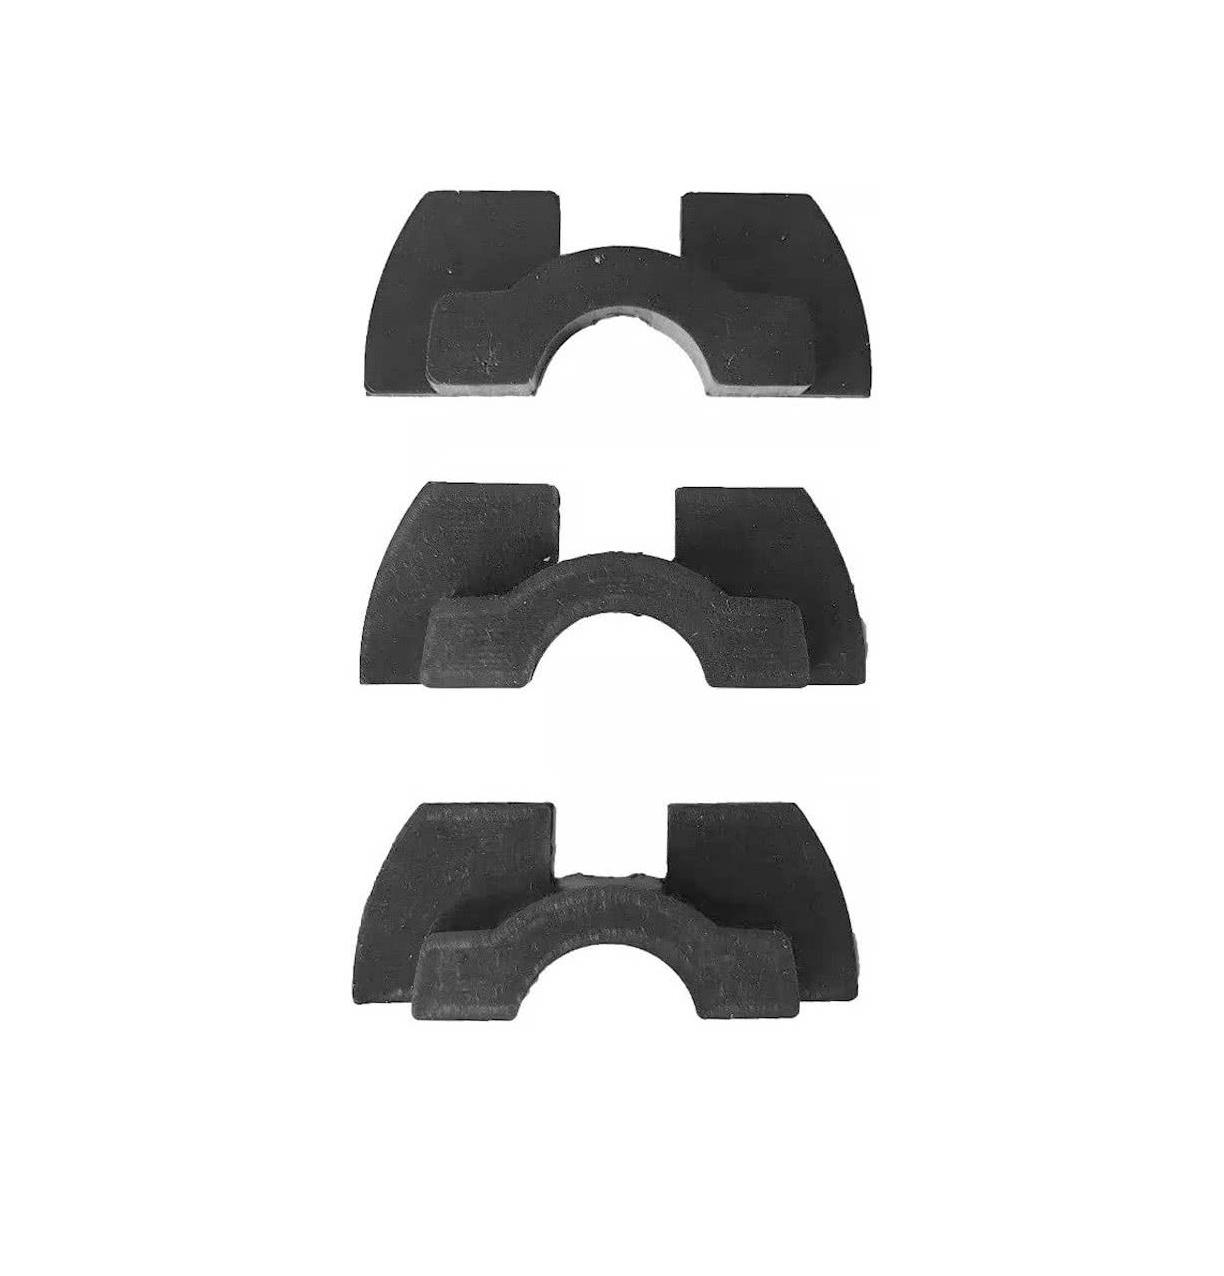 3PAD FDTwelve Επιθέματα Βάσης για Xiaomi Scooter M365 / M365 Pro Black 5906735414233